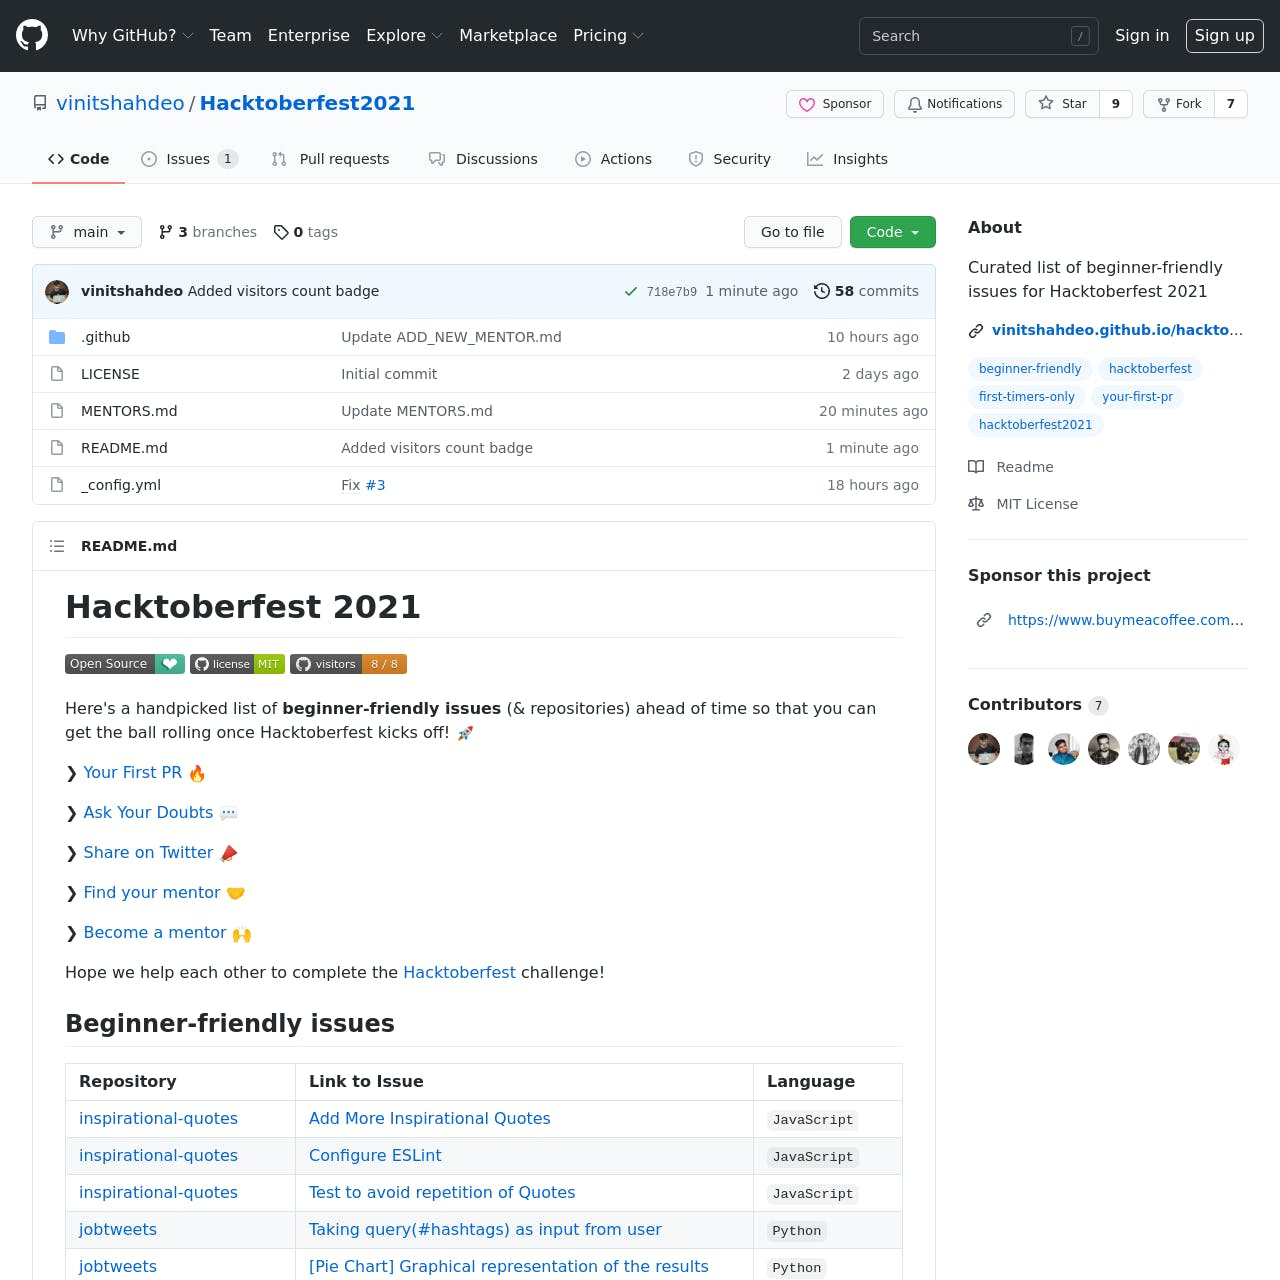 GitHub - vinitshahdeo_Hacktoberfest2021_ Curated list of beginner-friendly issues for Hacktoberfest 2021